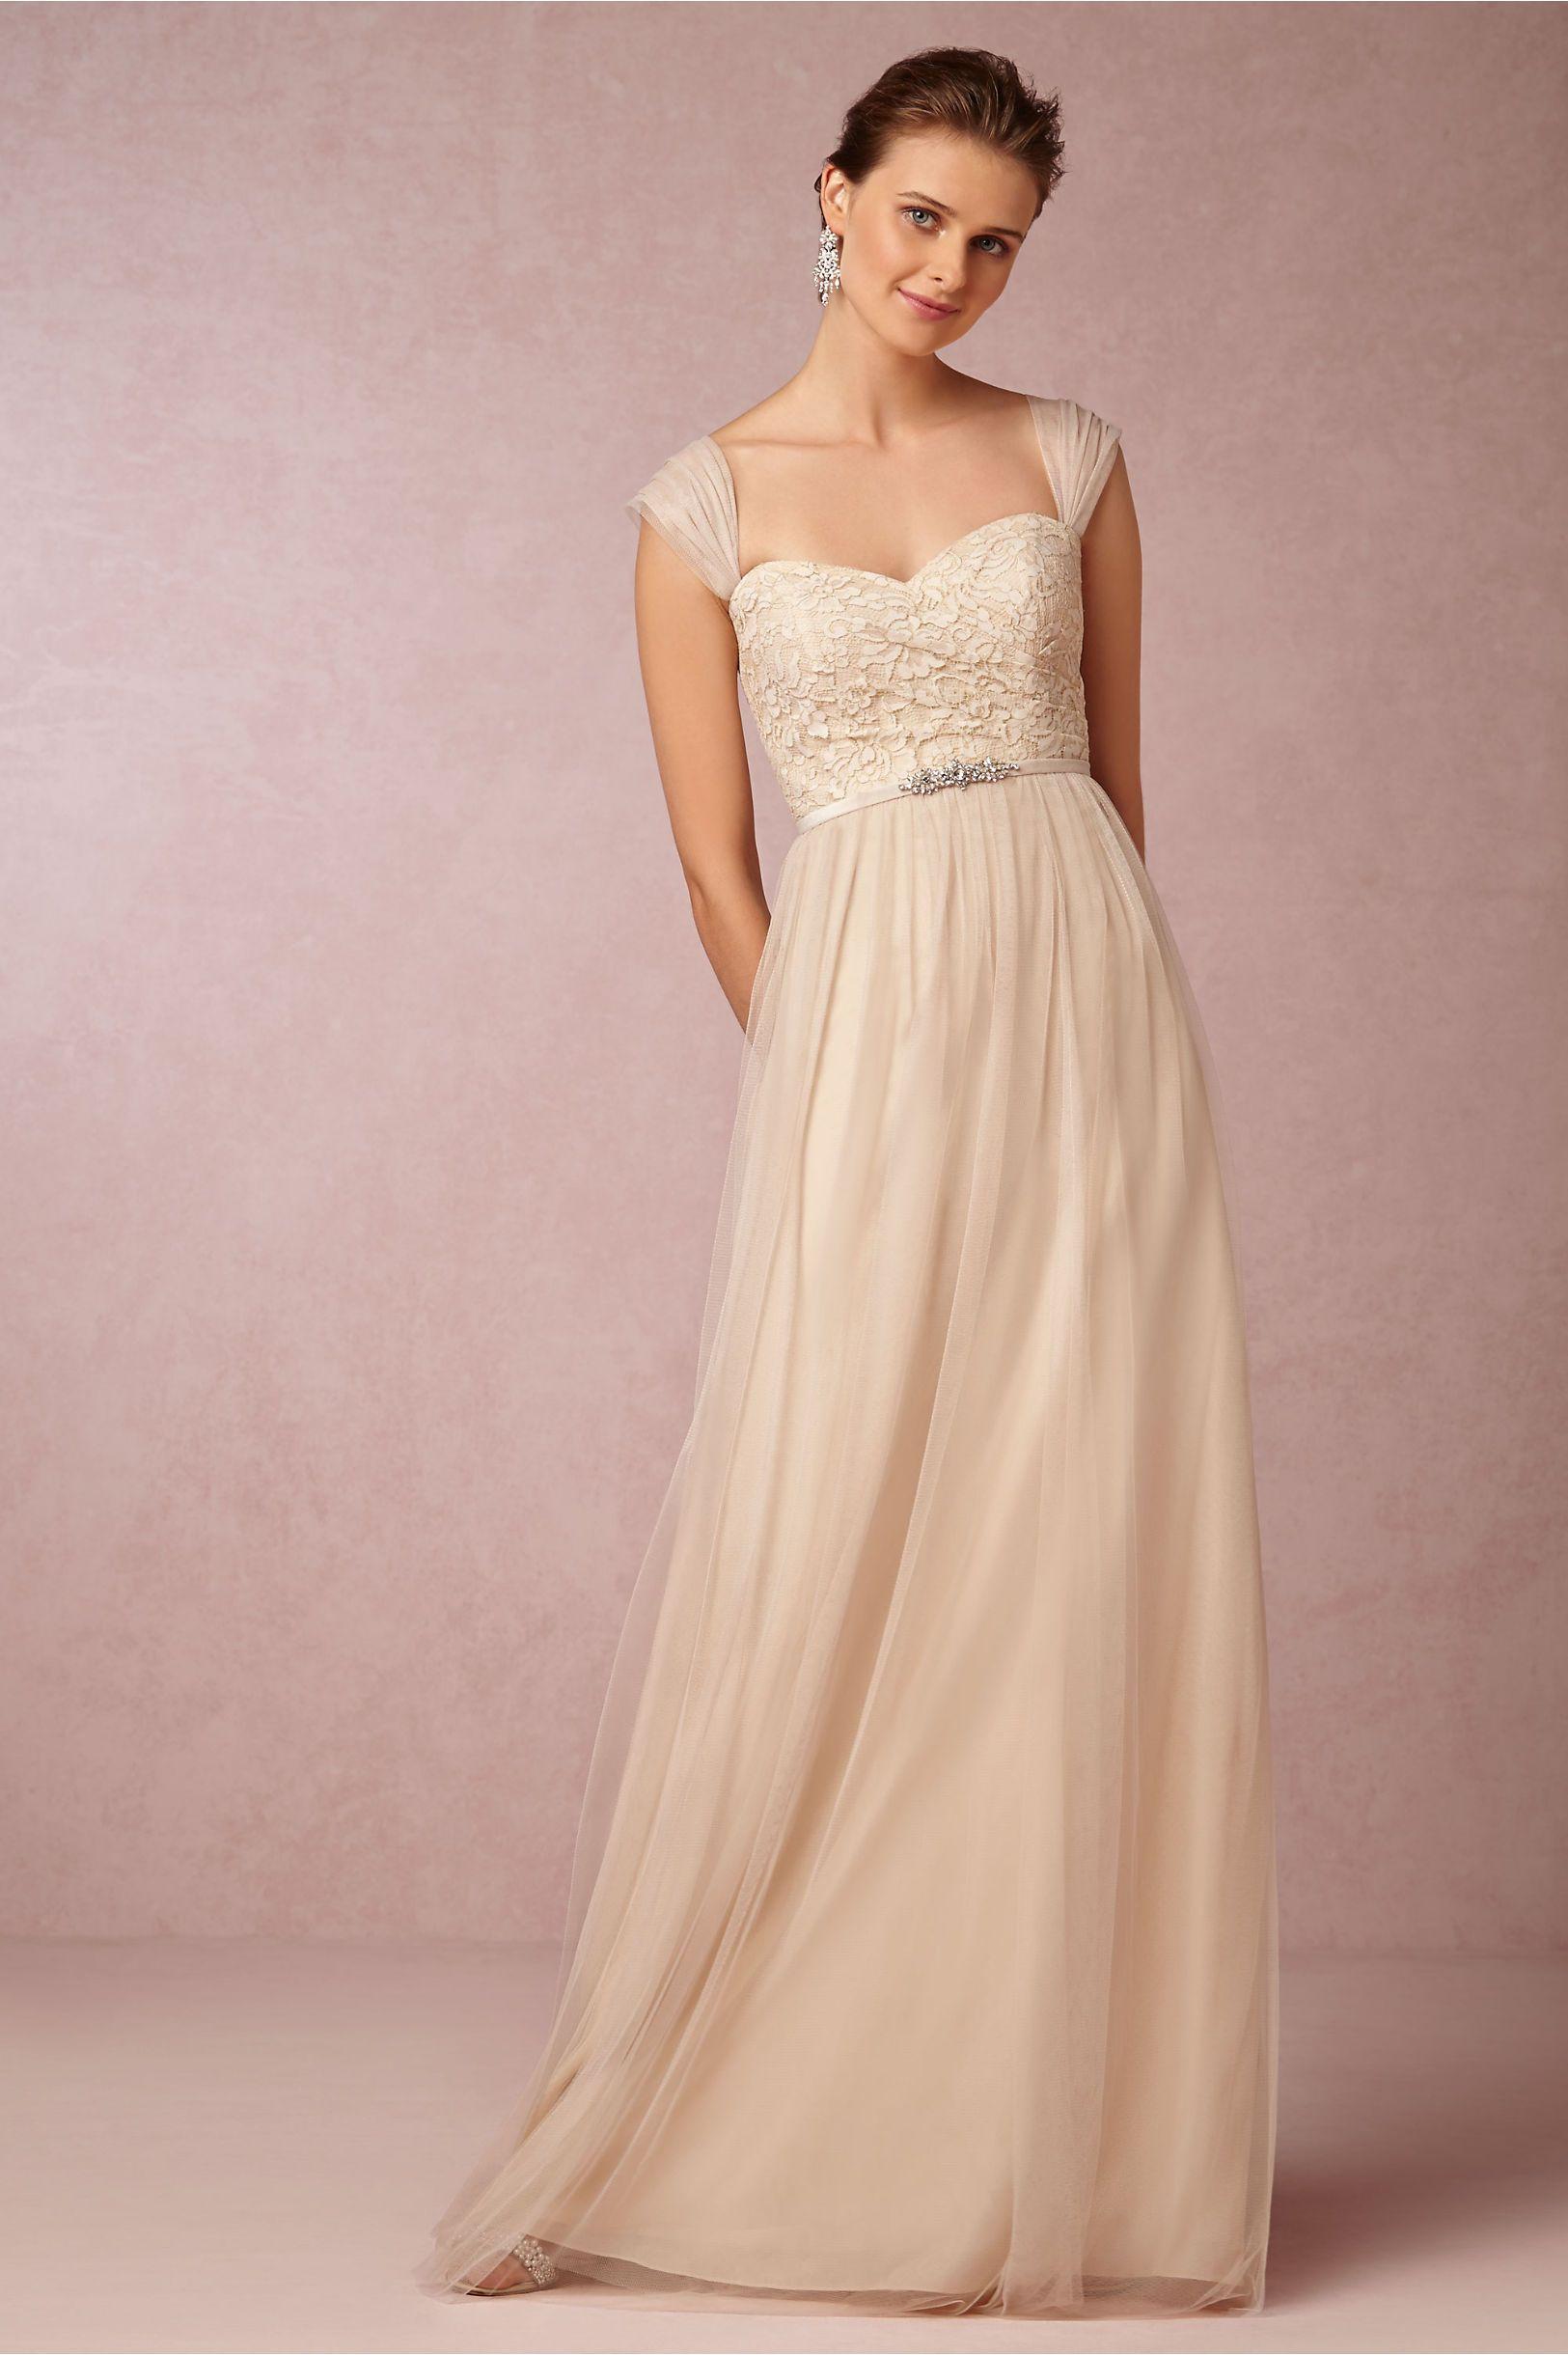 Juliette dress from bhldn wedding dressstyle ideas pinterest